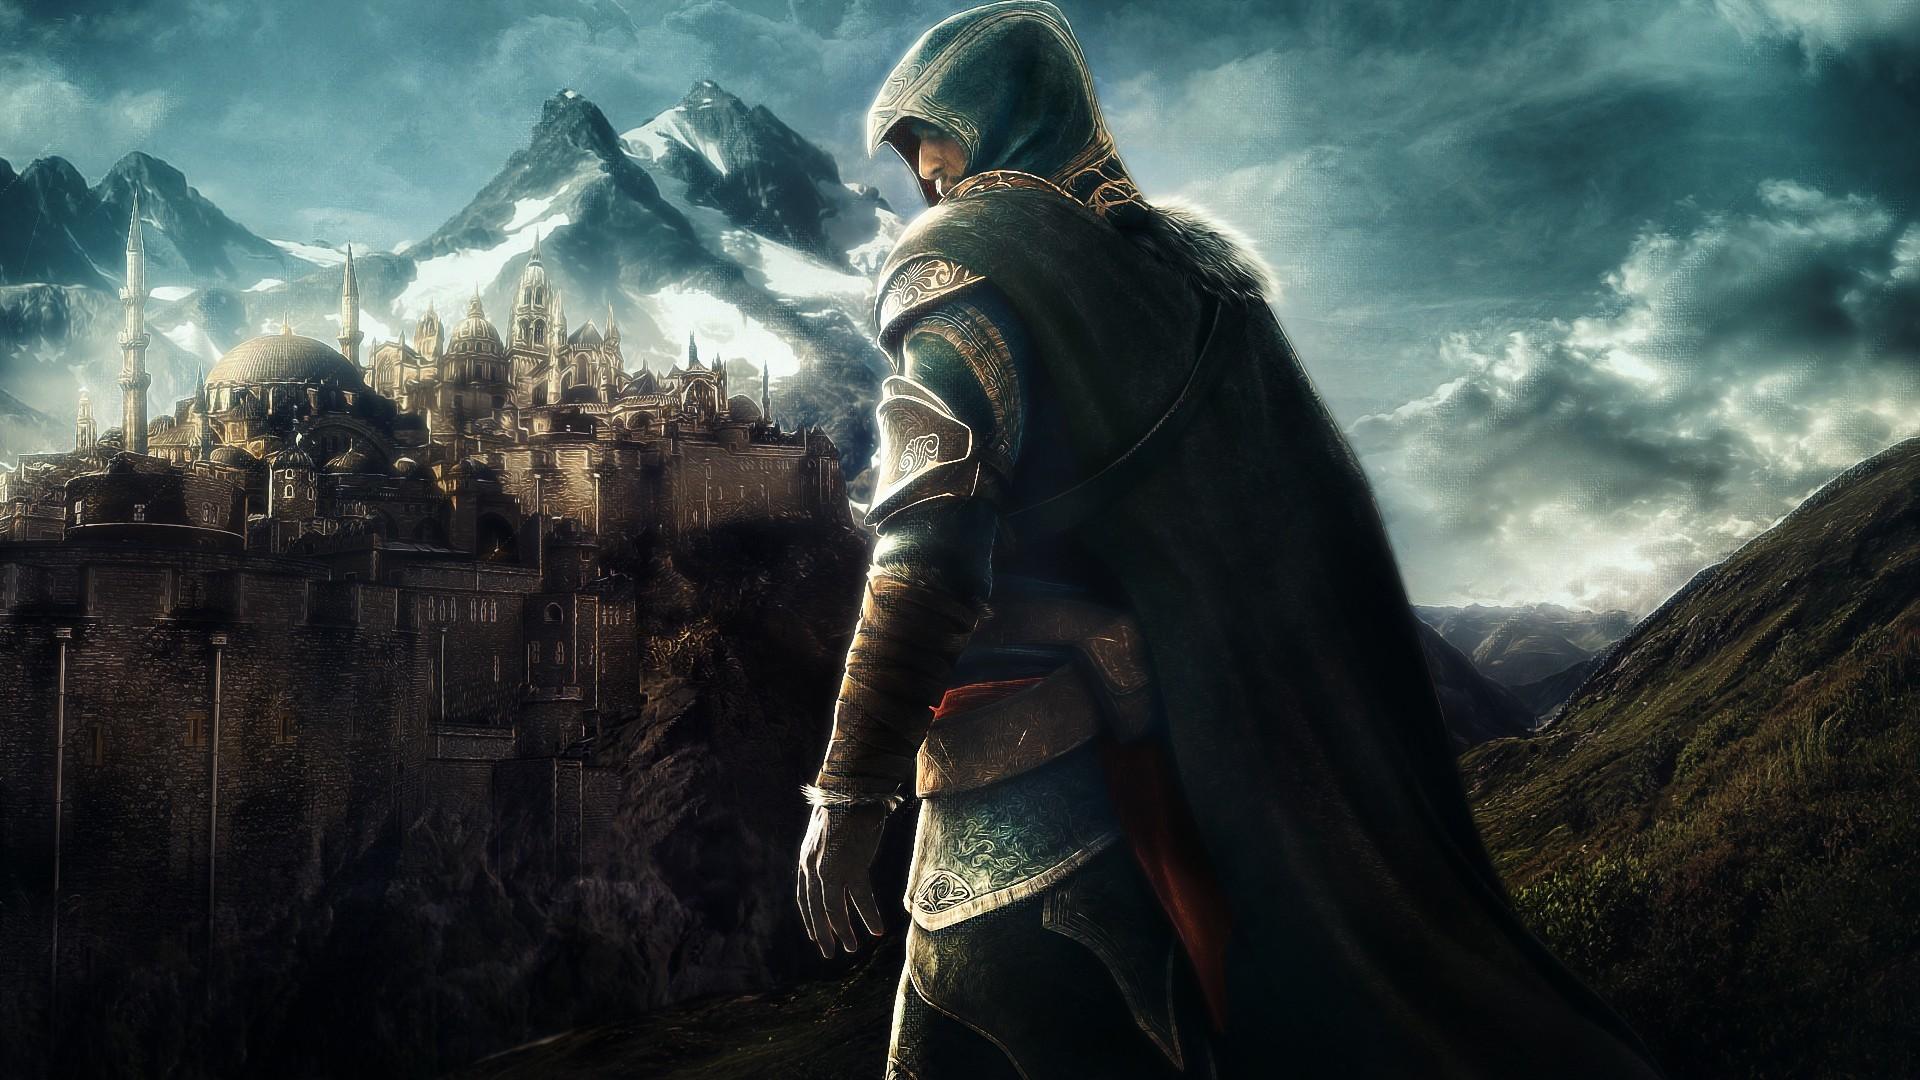 Best Gaming Wallpapers HD Best HD Widescreen wallpapers